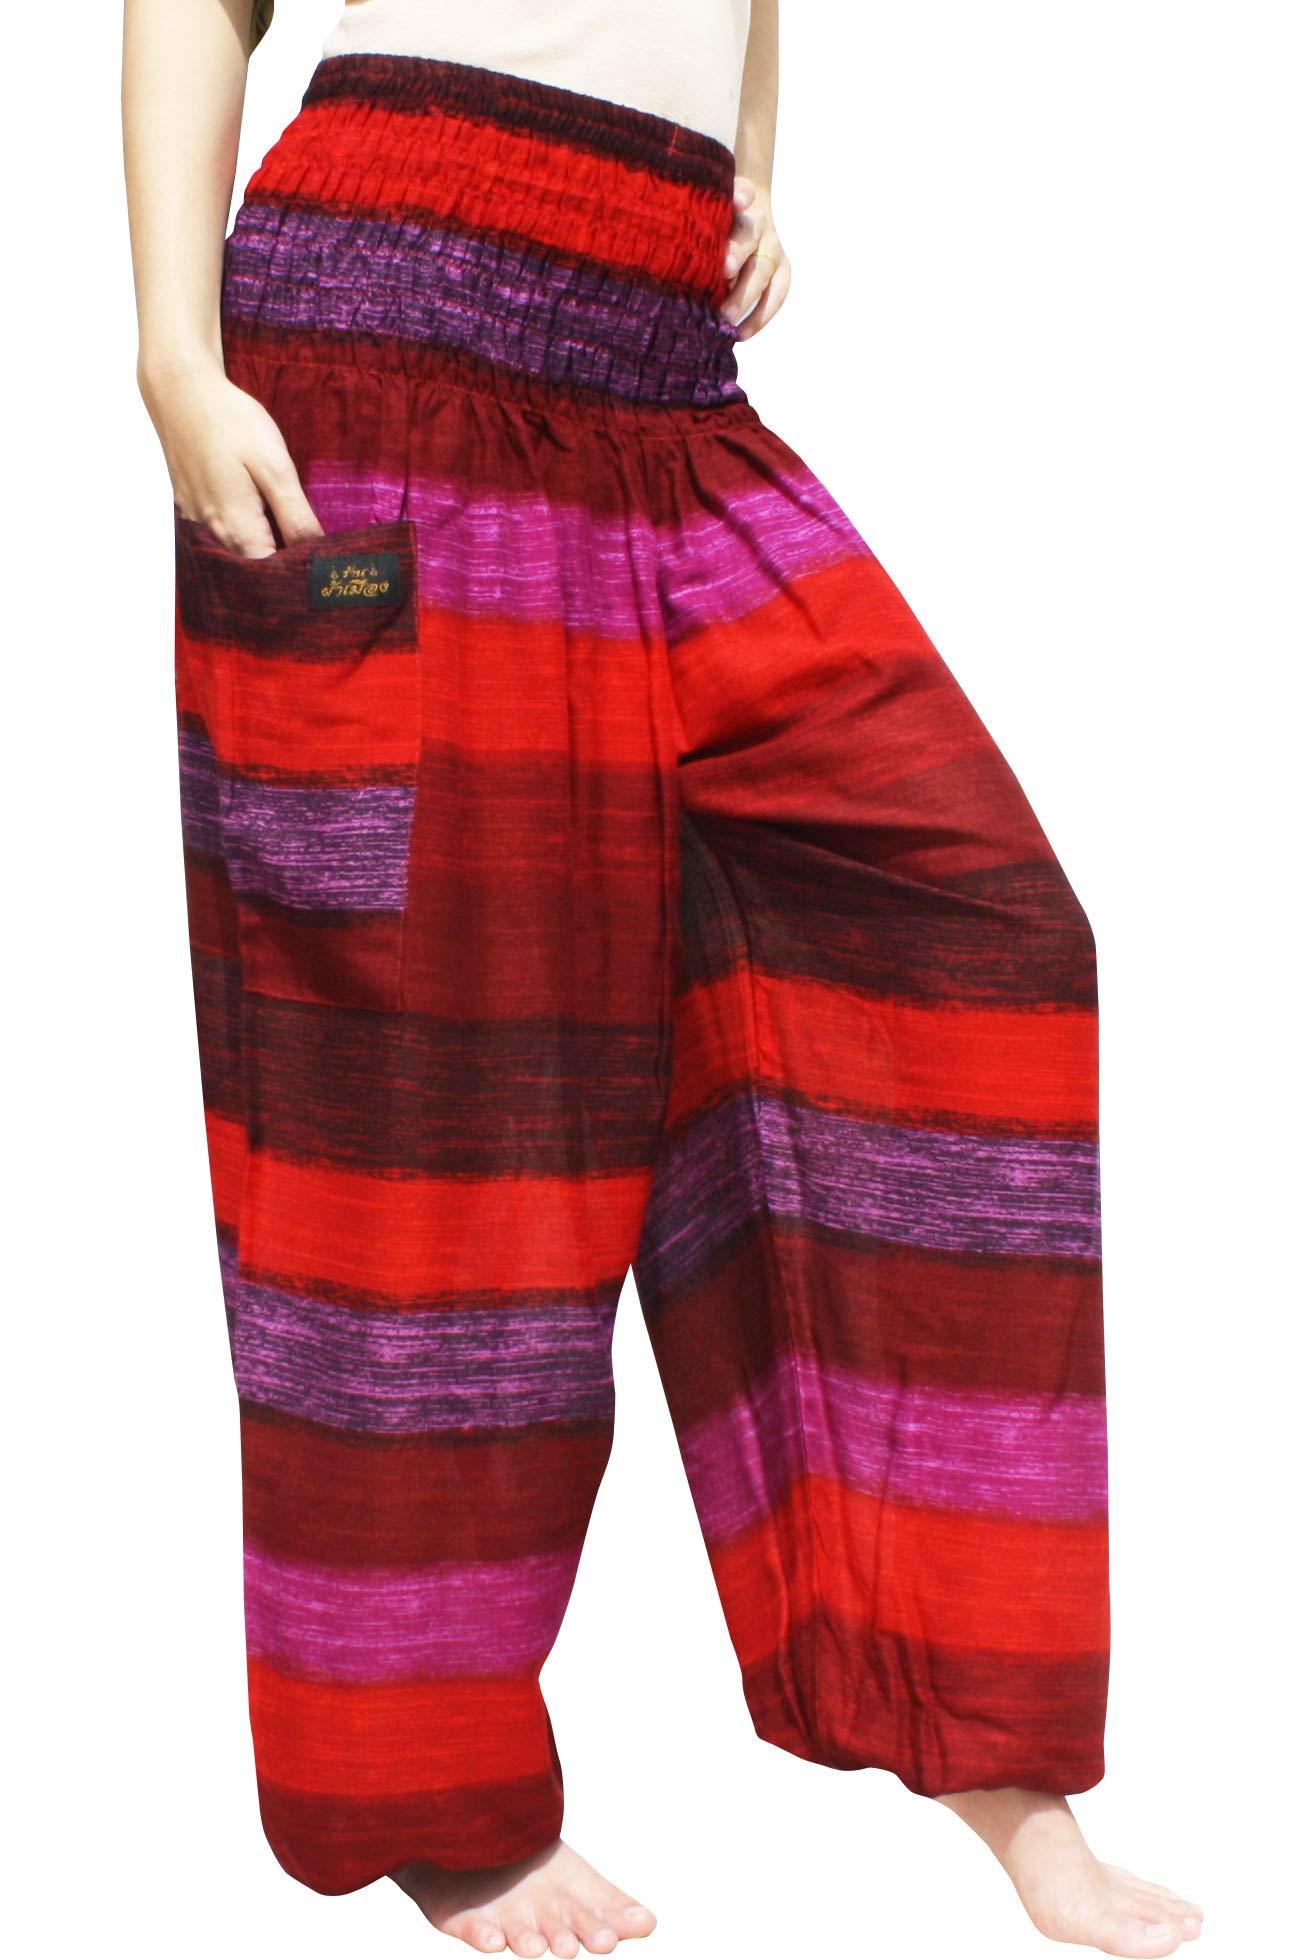 RaanPahMuang Brand Smock Waist Rayon Mixed Art Harem Baggy Aladdin Pants, Small, Rainbow Stripes - Red Violet by RaanPahMuang